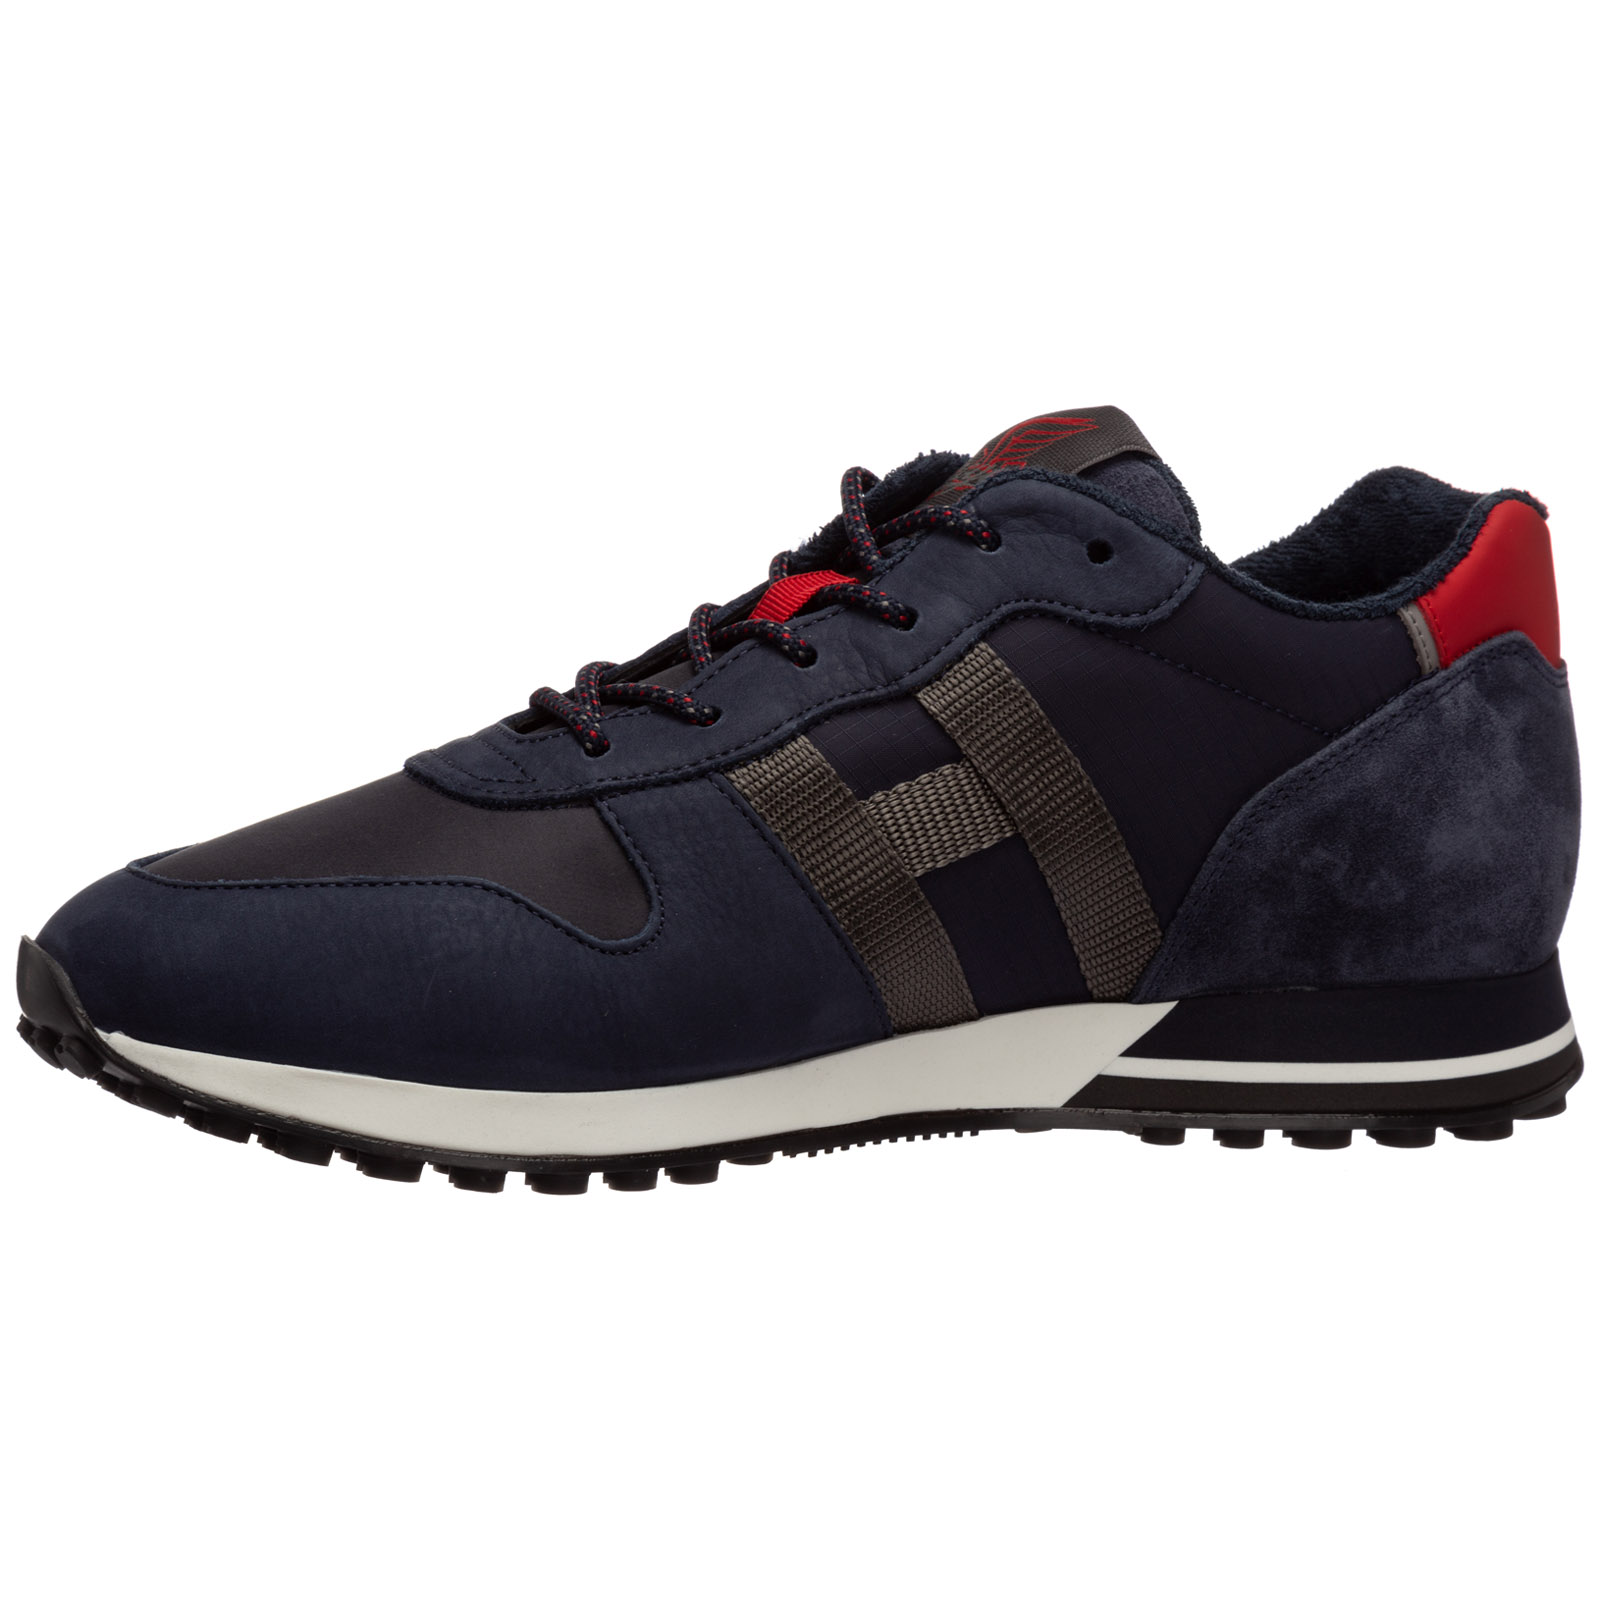 Scarpe sneakers uomo in pelle h383